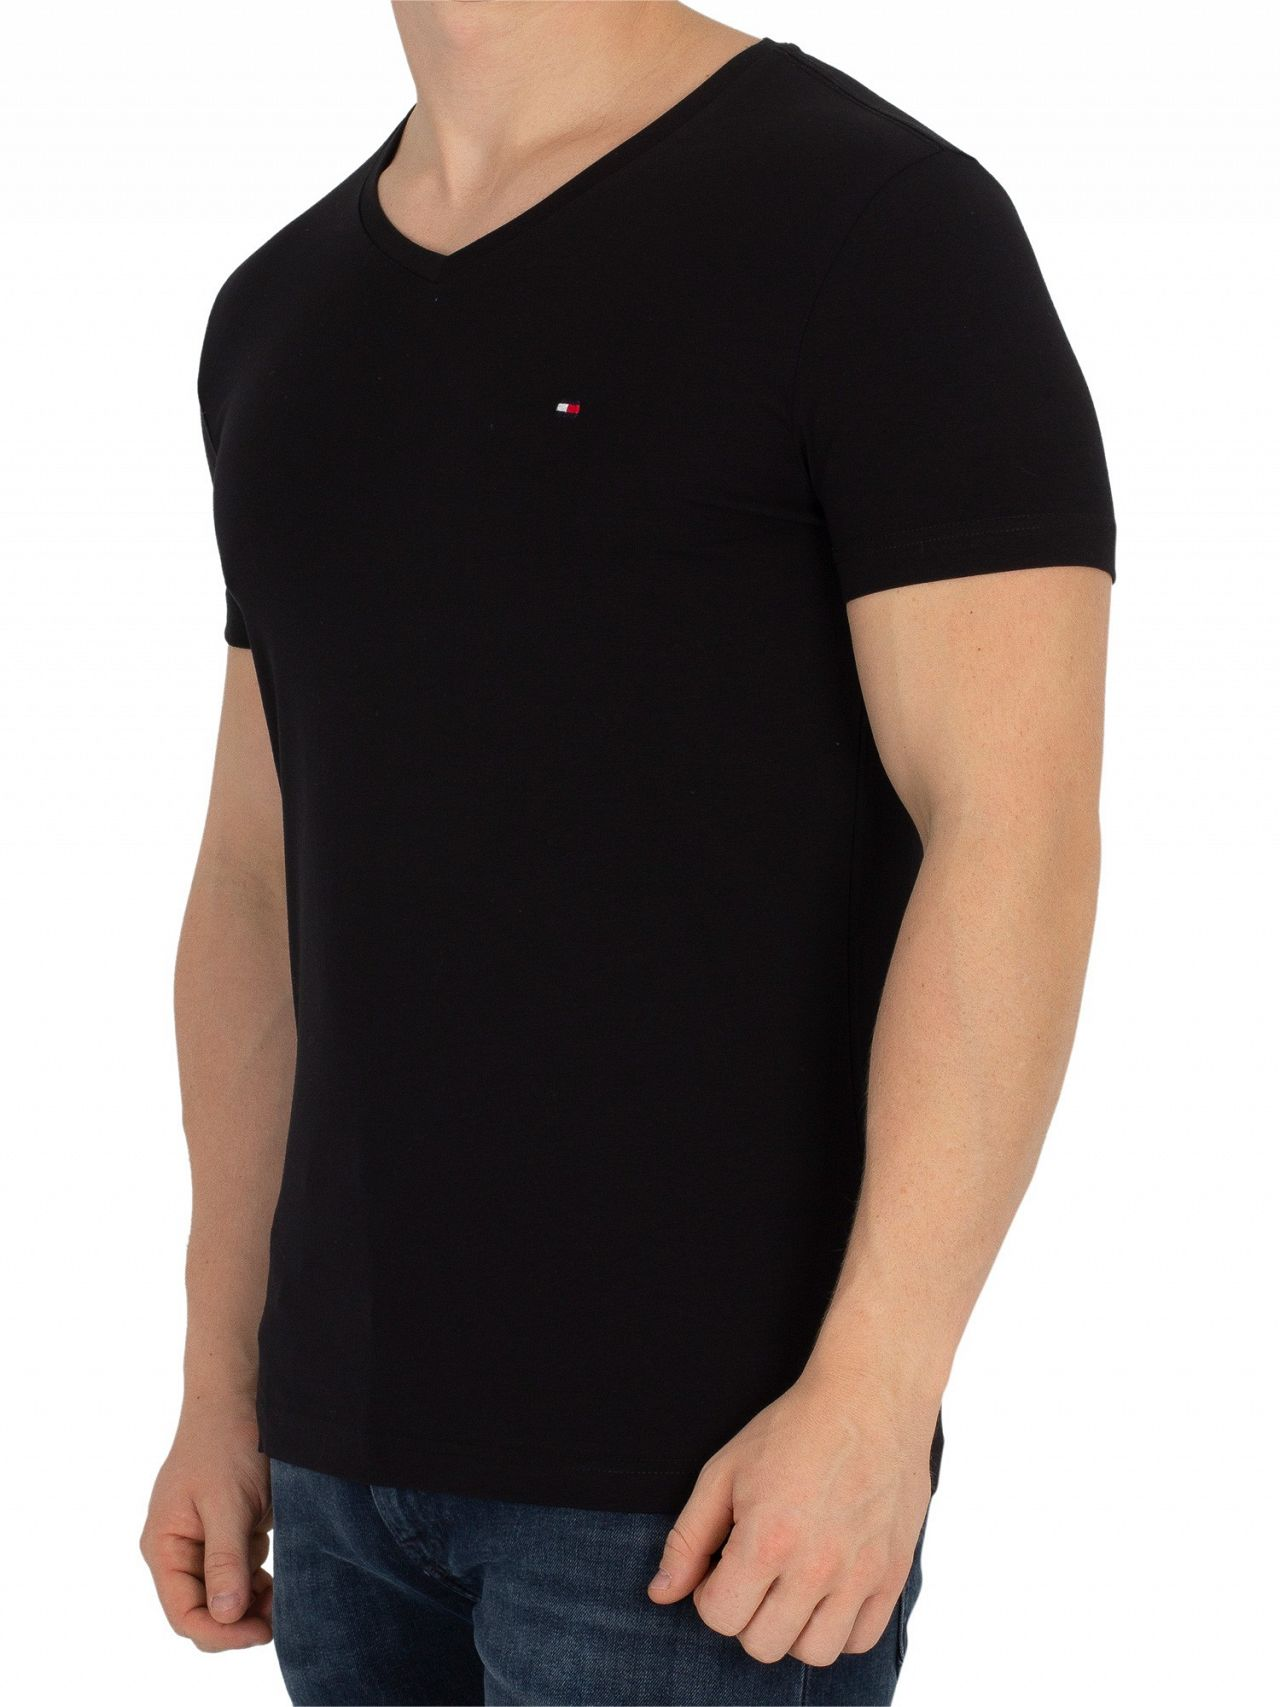 3e4f0cc5 Tommy Hilfiger Flag Black Core Stretch Slim V-Neck T-Shirt. Tap to expand